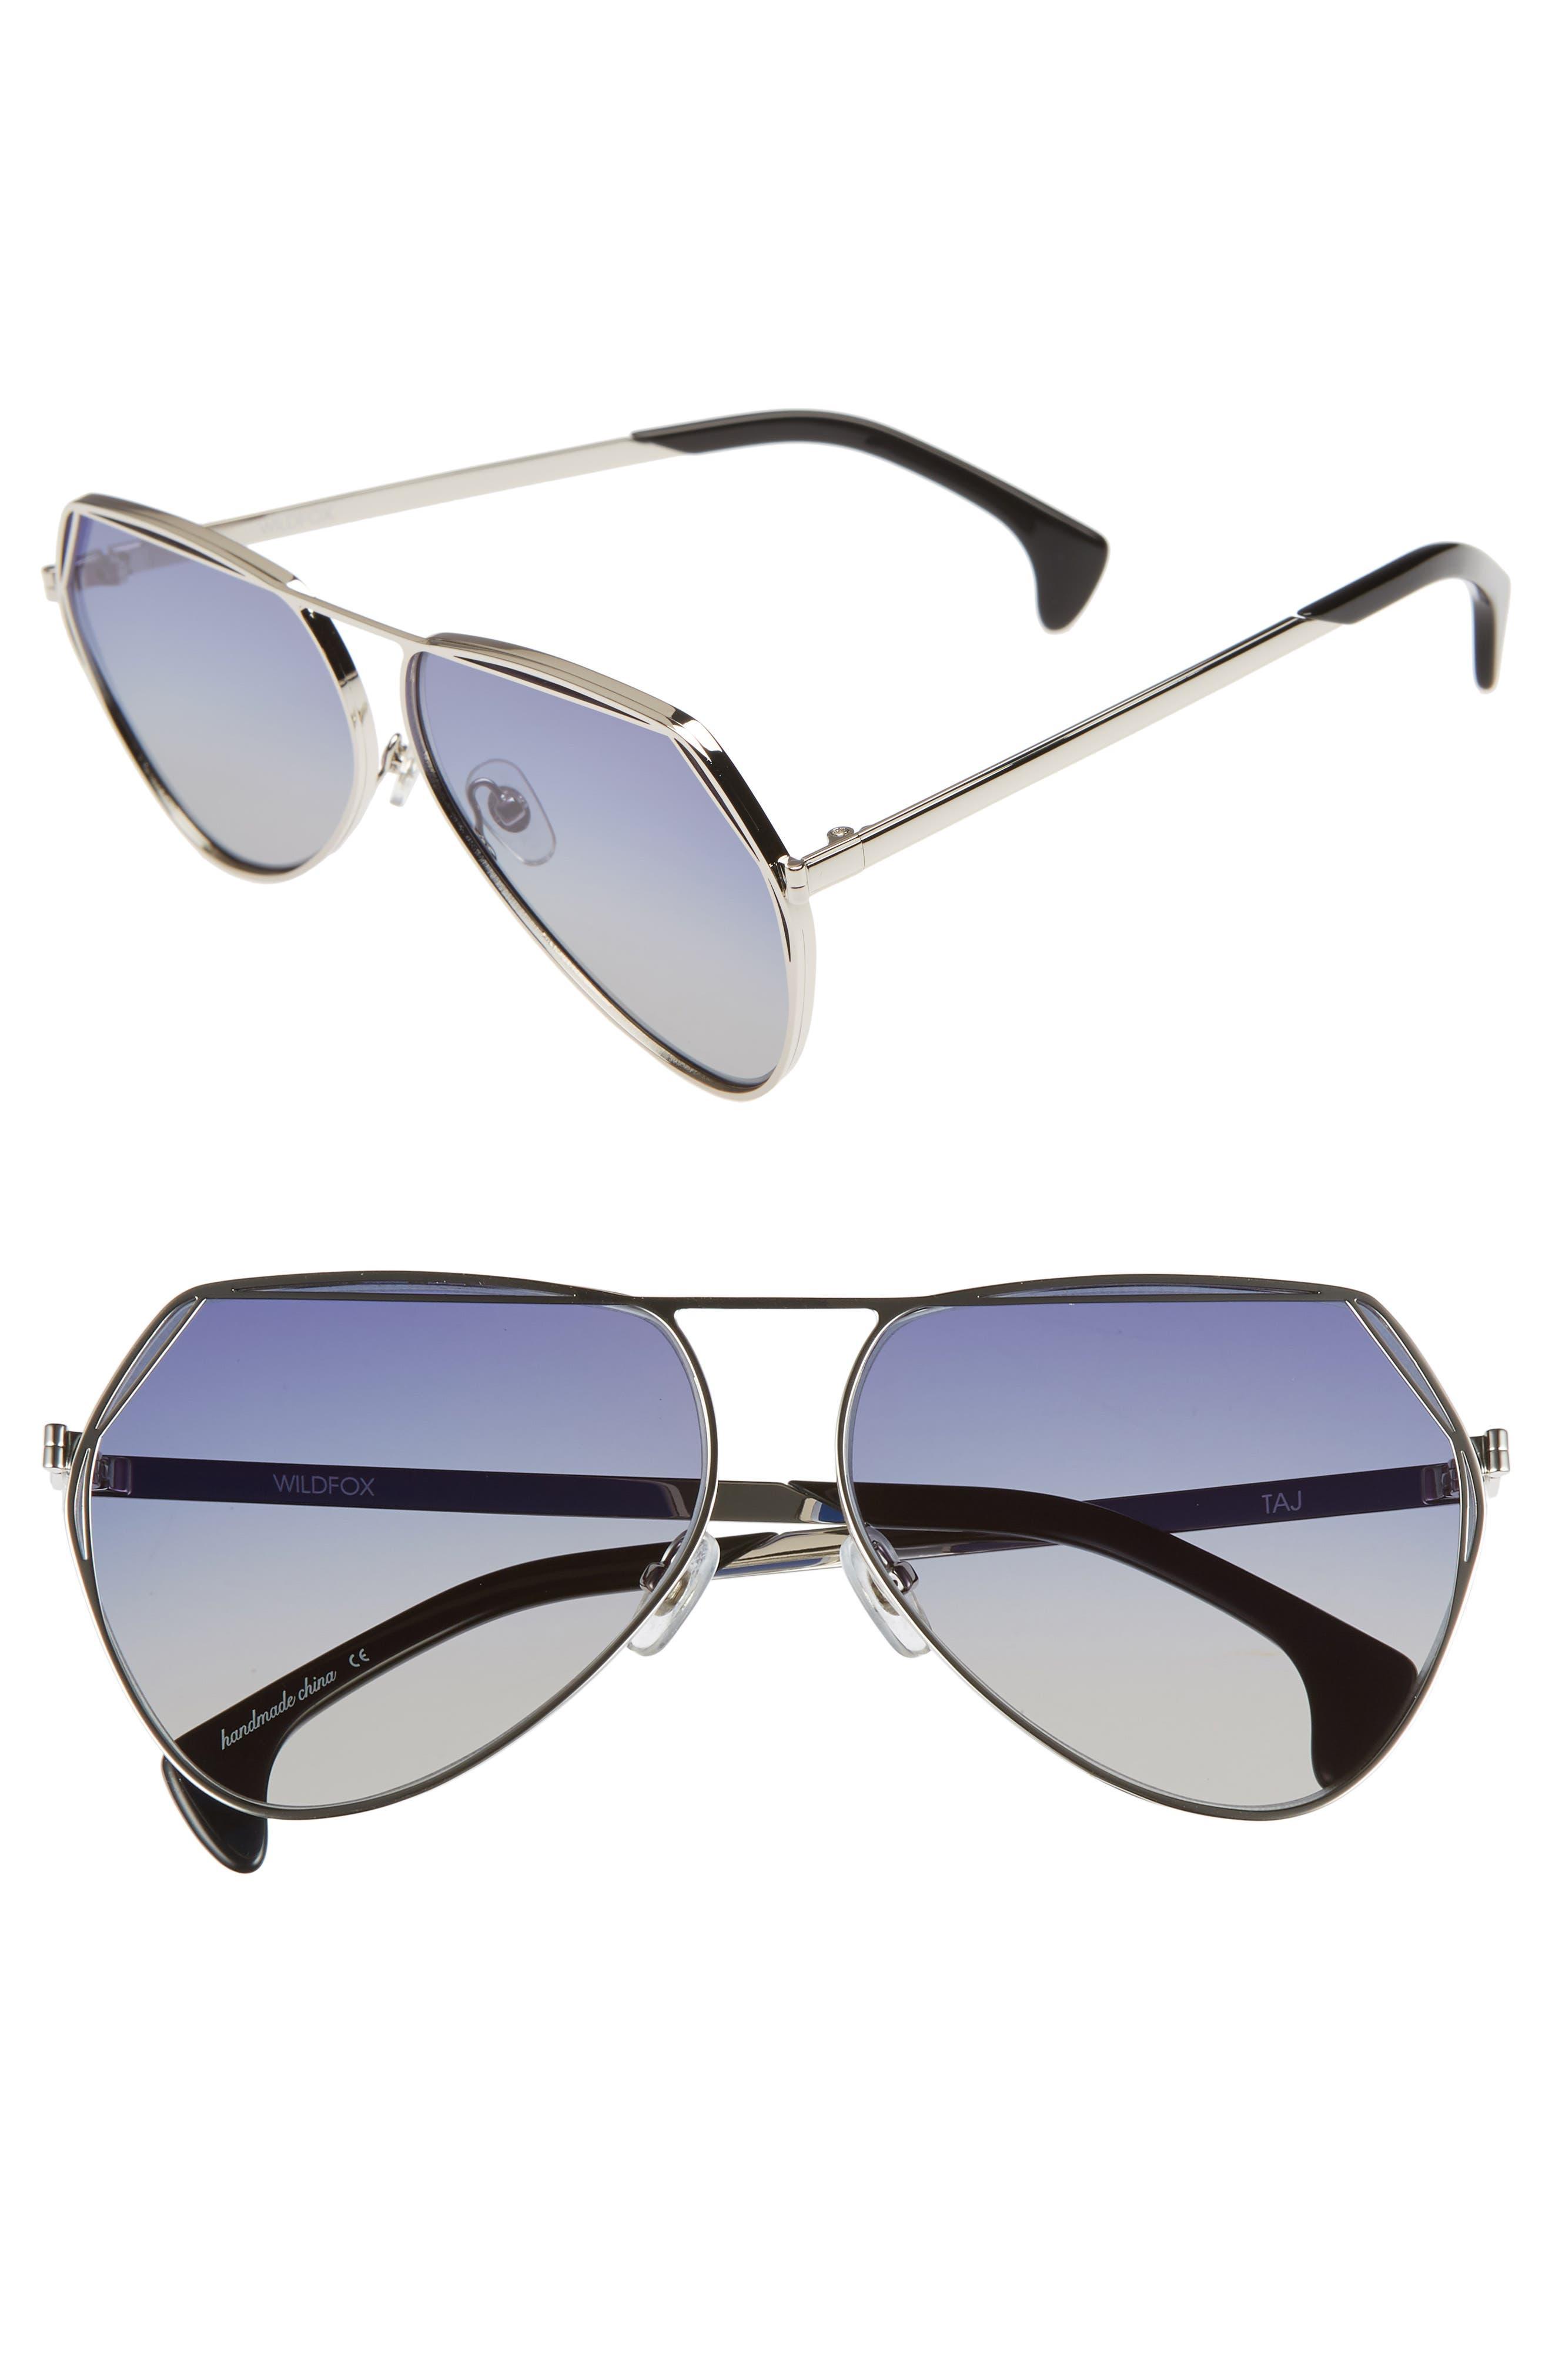 Taj 62mm Oversize Aviator Sunglasses,                             Main thumbnail 1, color,                             SILVER/ GREY-BLUE GRADIENT